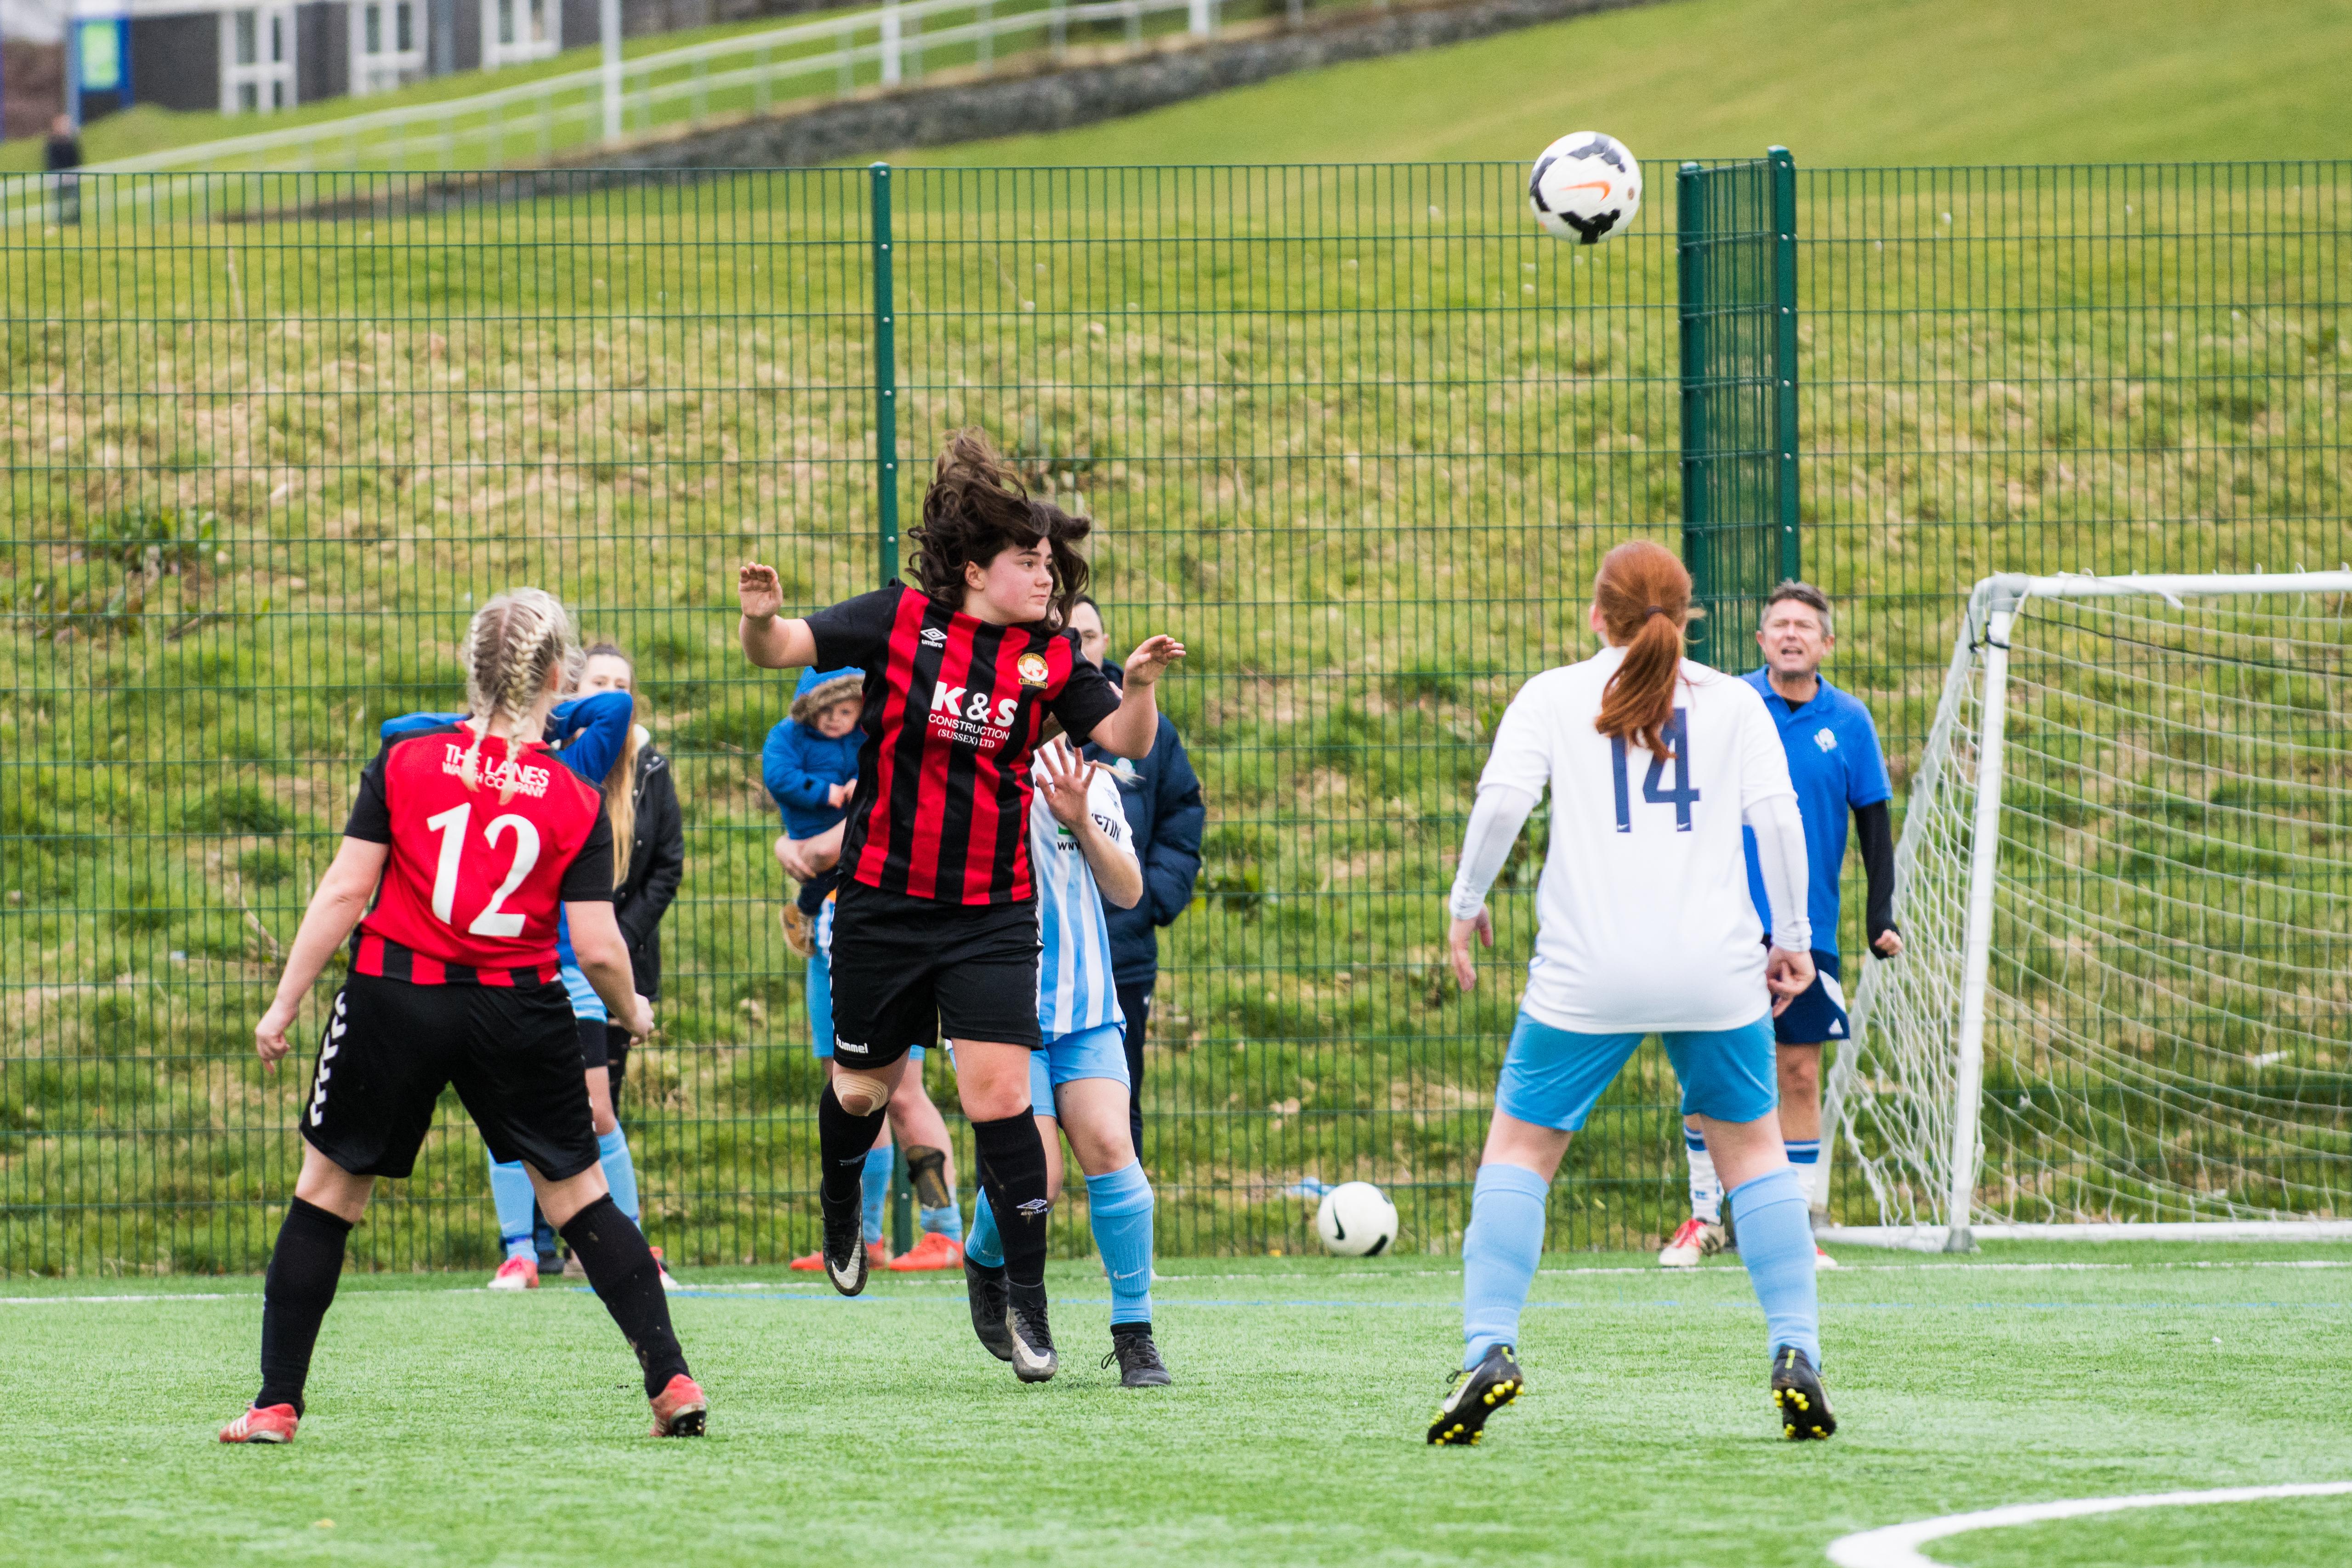 DAVID_JEFFERY Saltdean Utd Ladies FC vs Worthing Utd Ladies FC 11.03.18 54